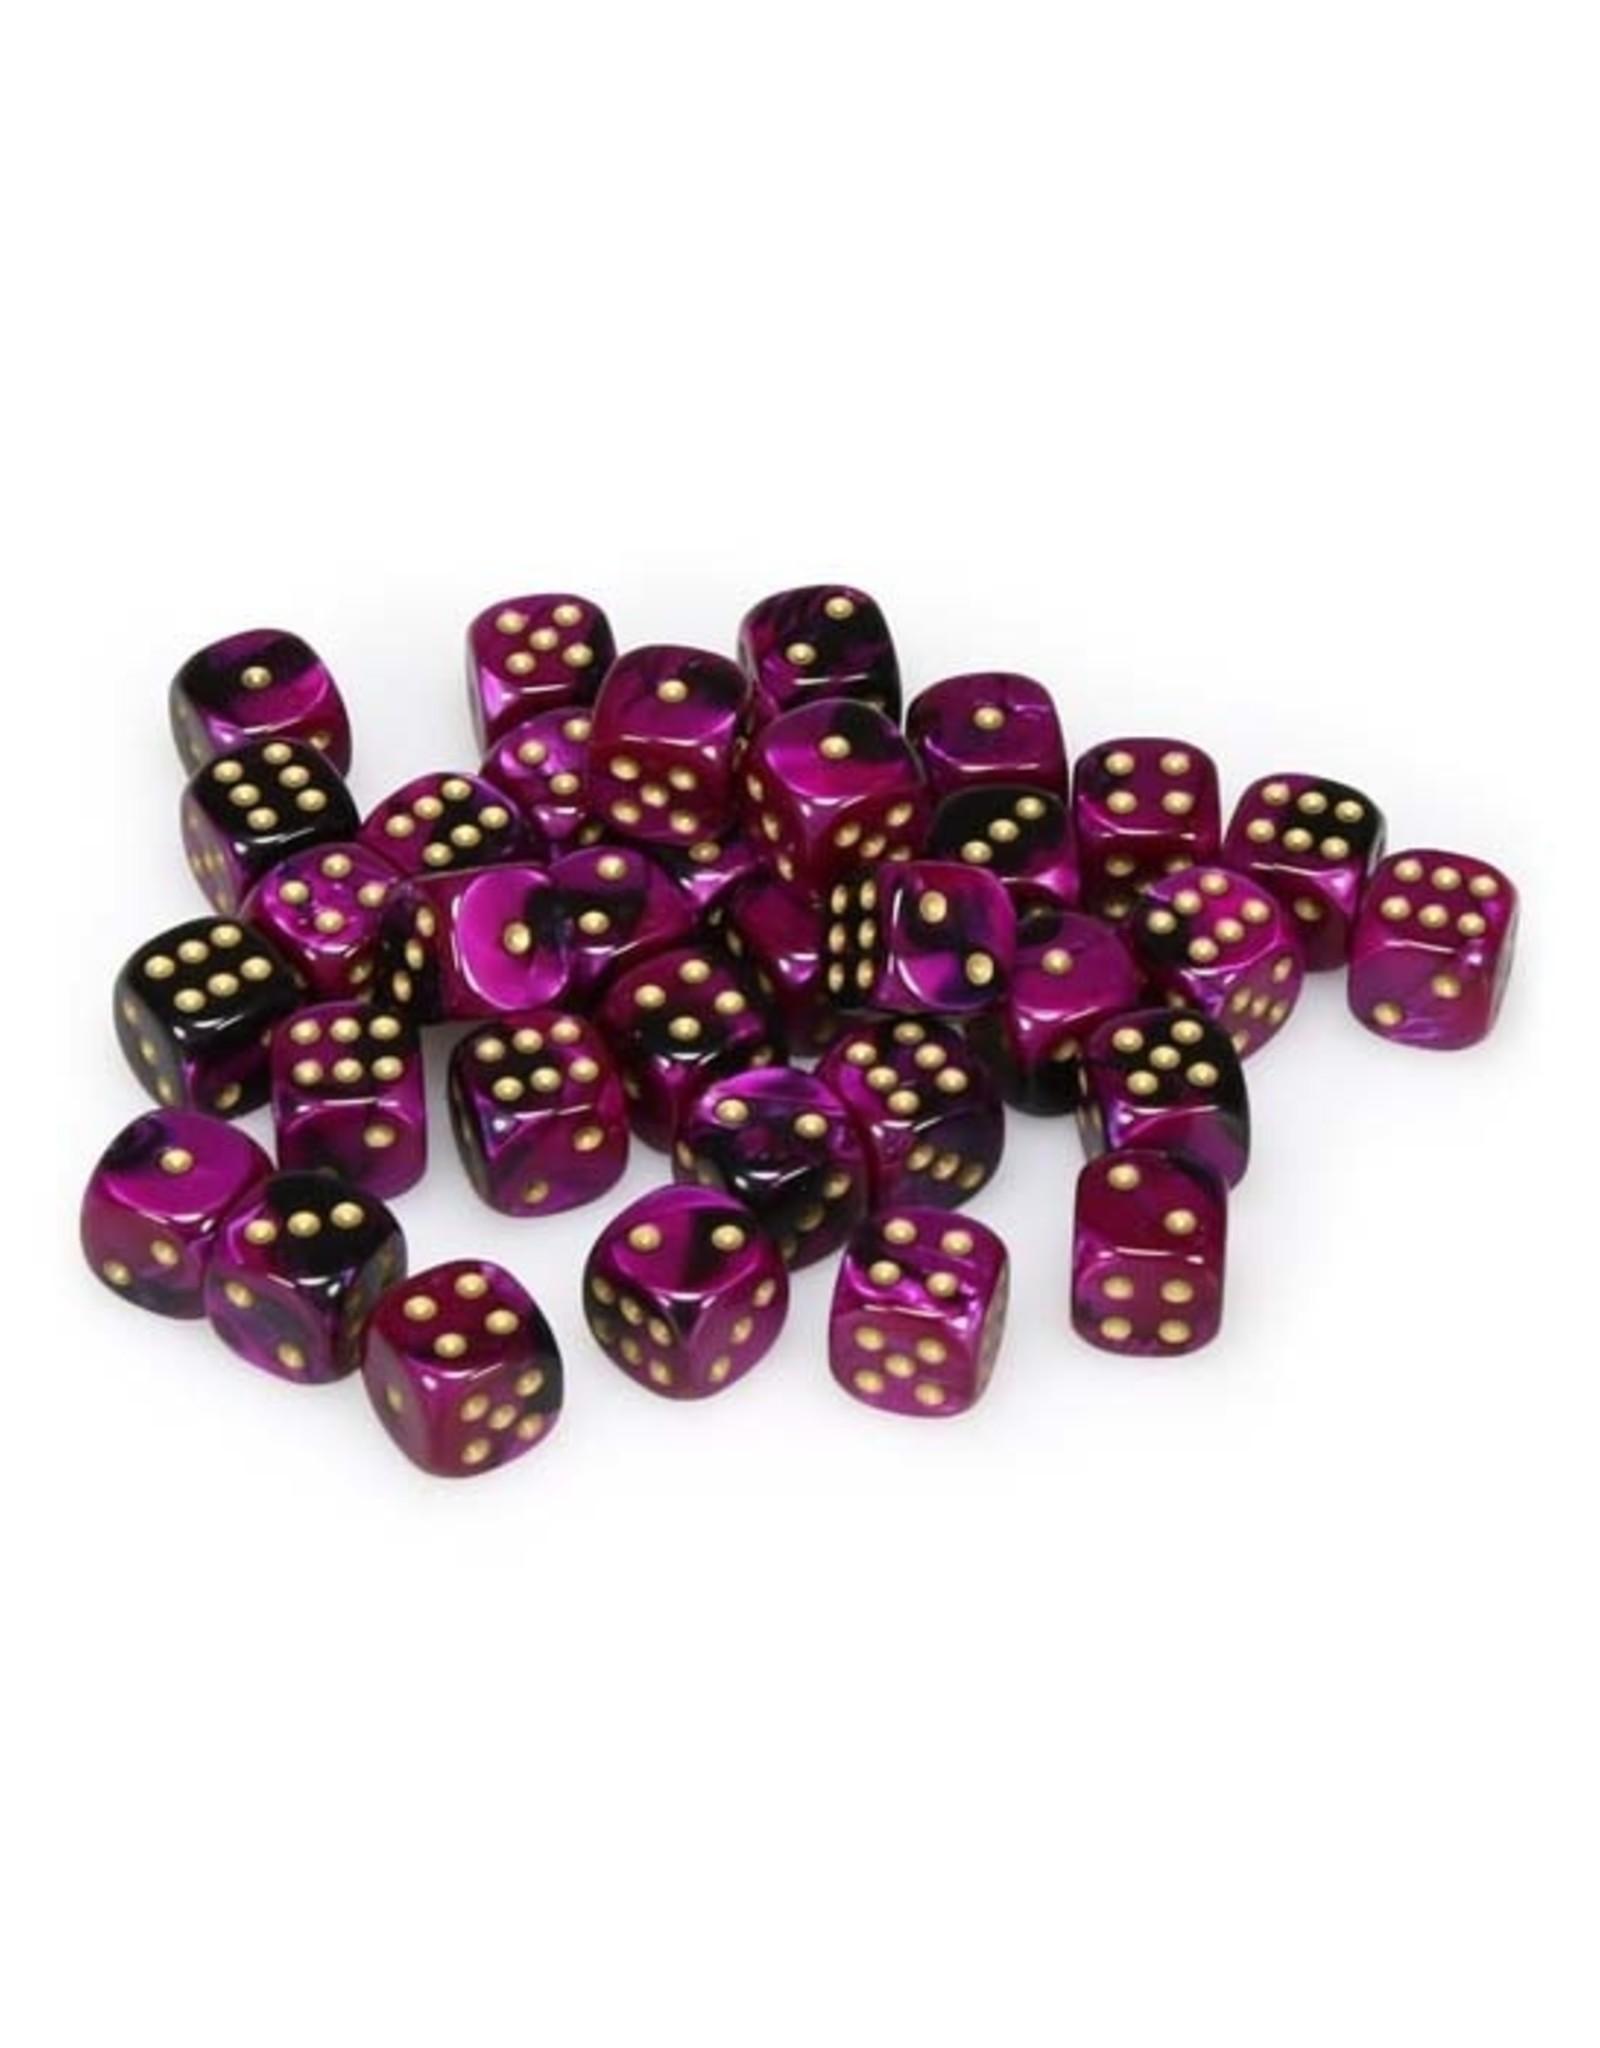 Chessex Chessex: 12mm D6 - Gemini - Black-Purple w/ Gold